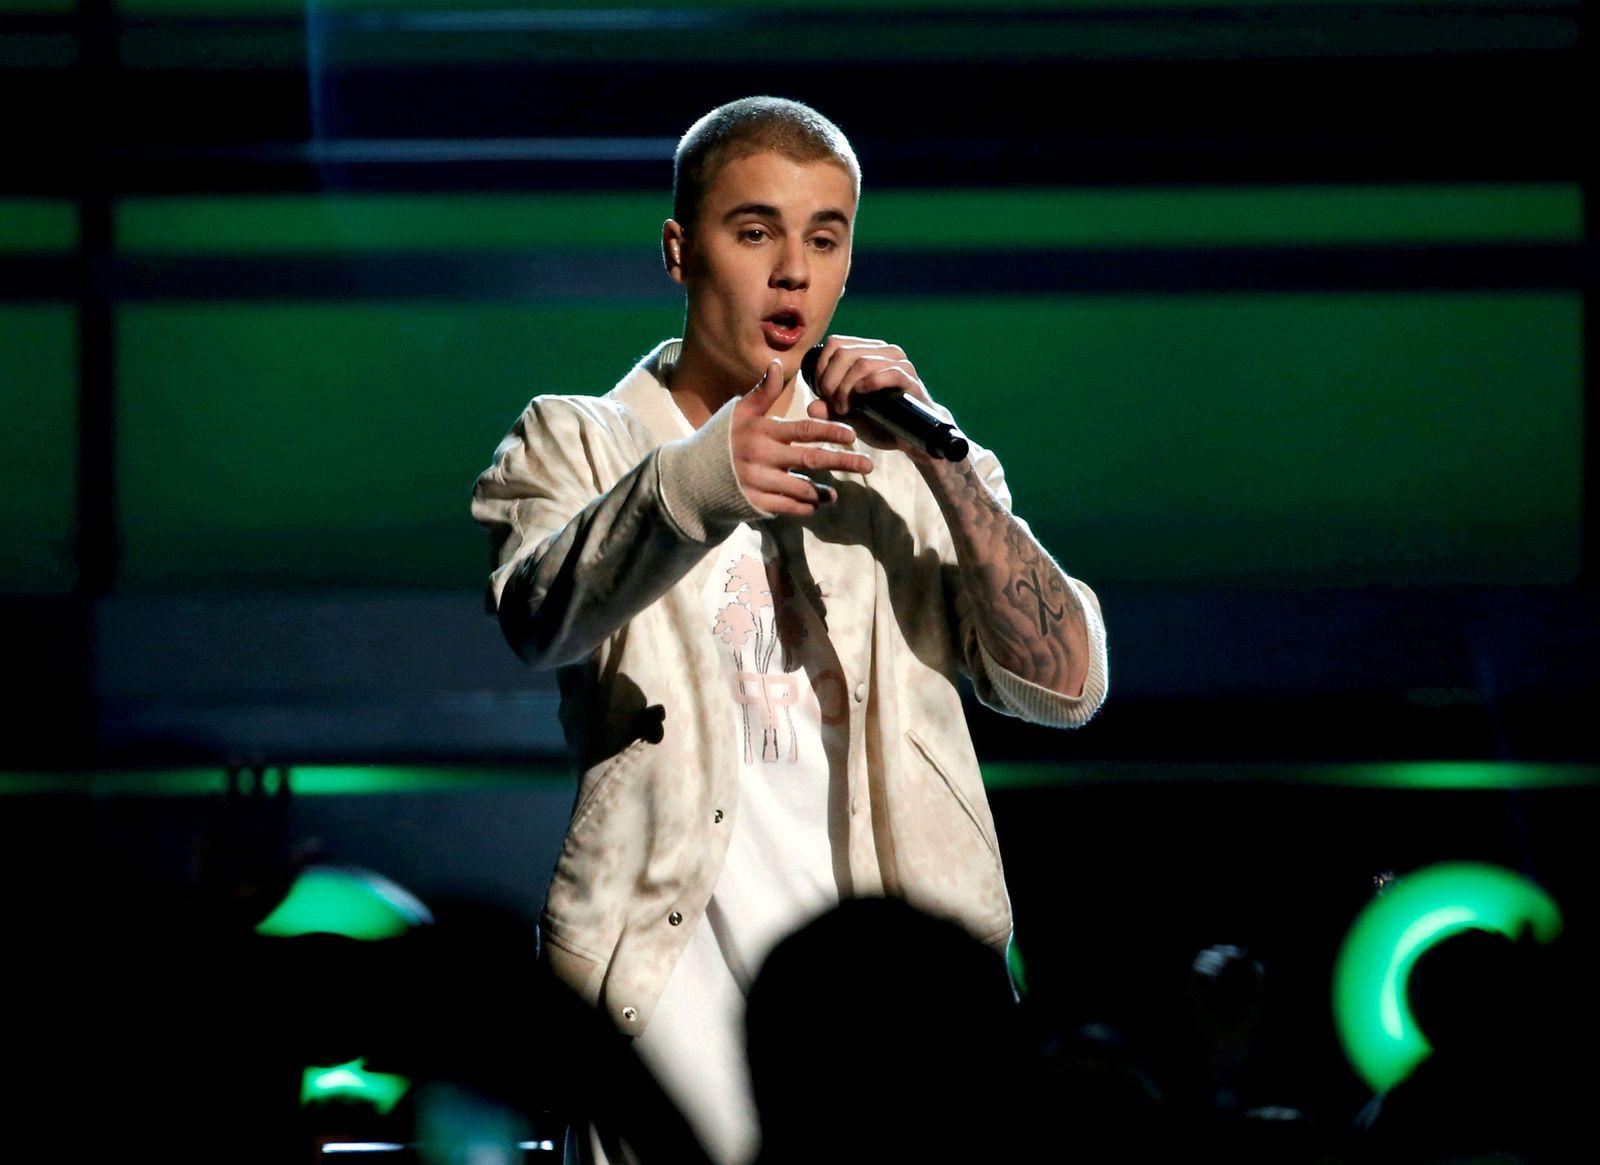 Justin Bieber/